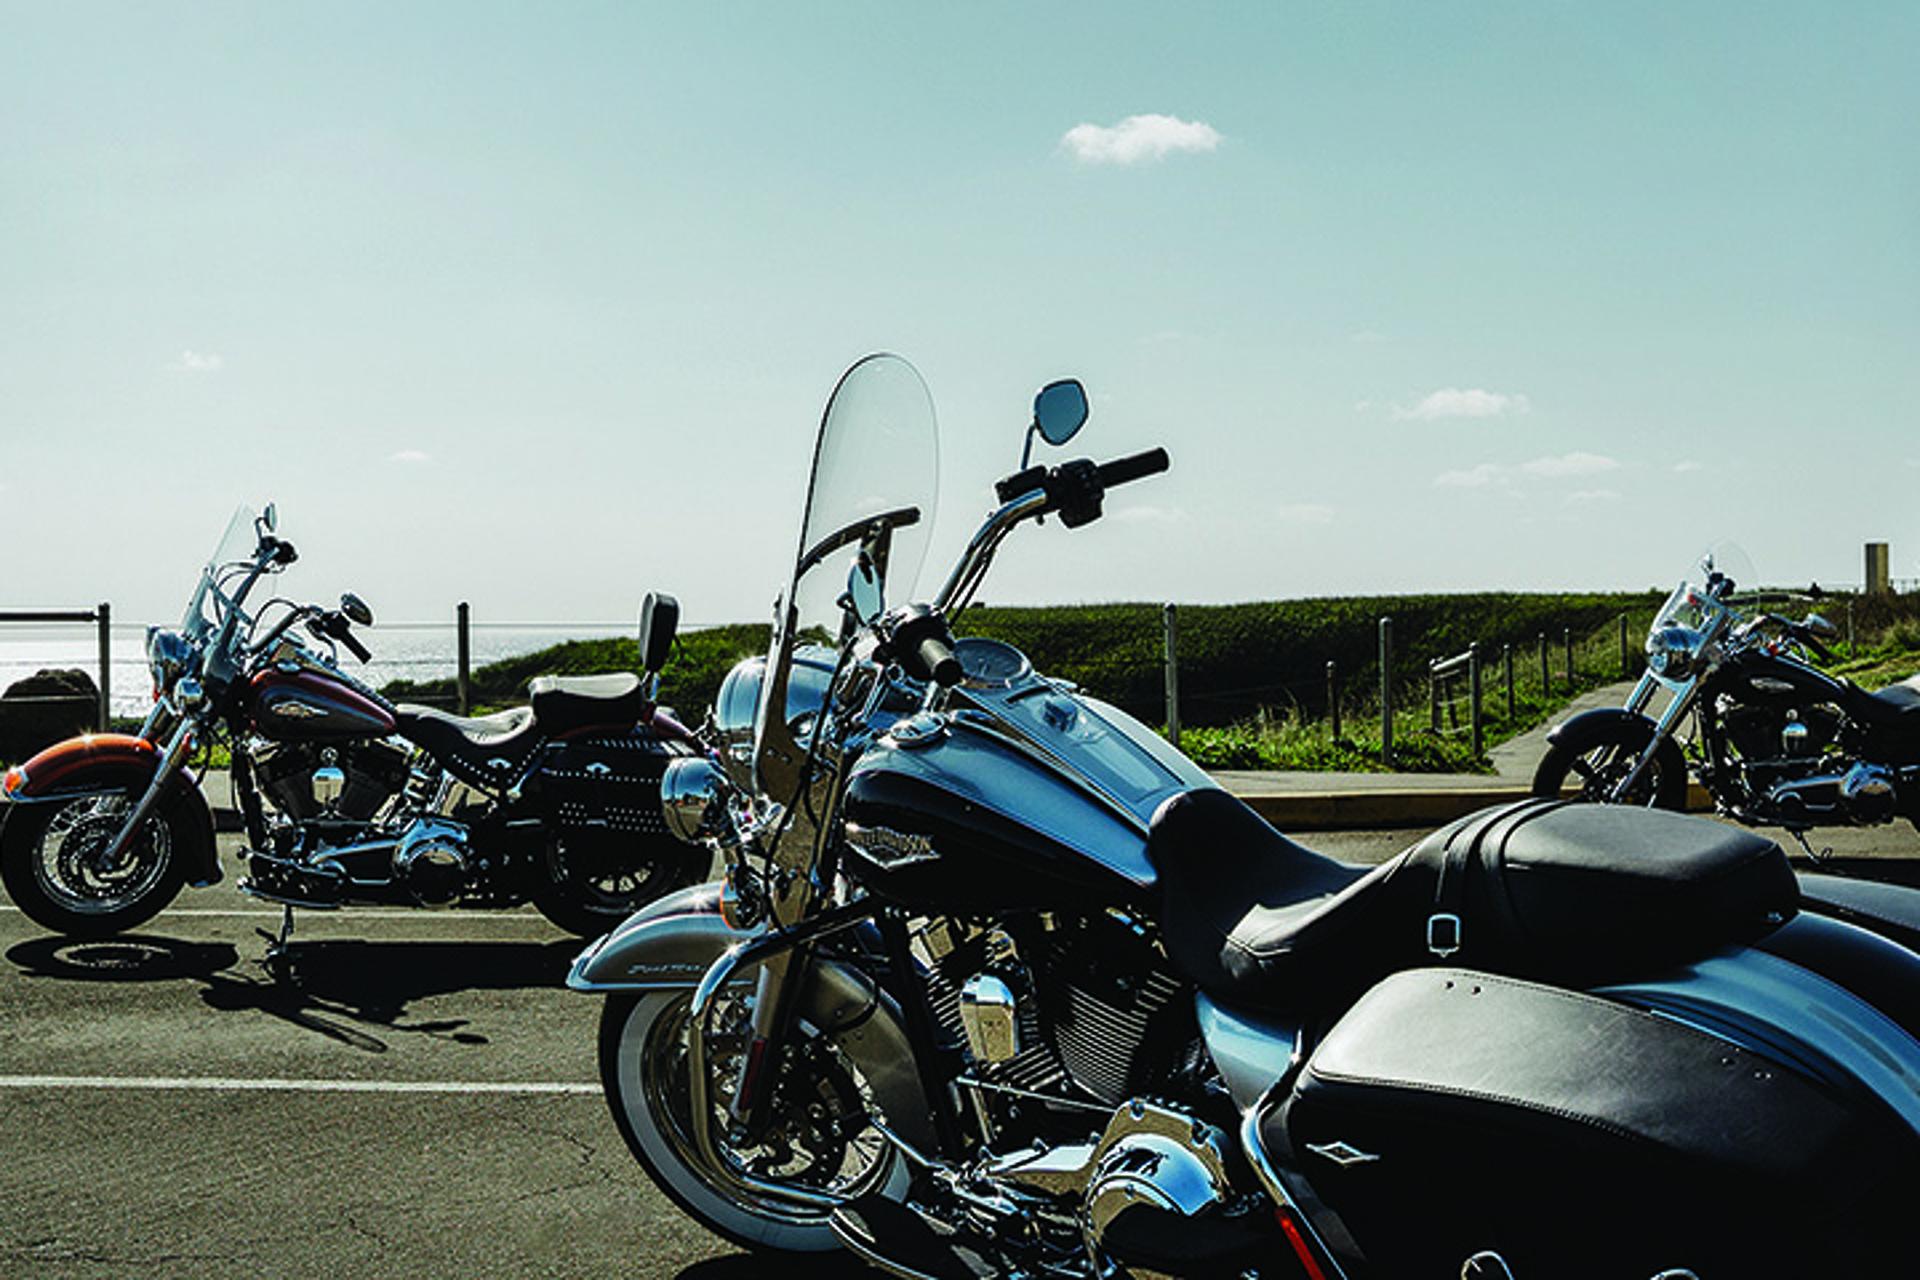 Harley-Davidson Suffering from Major Recalls